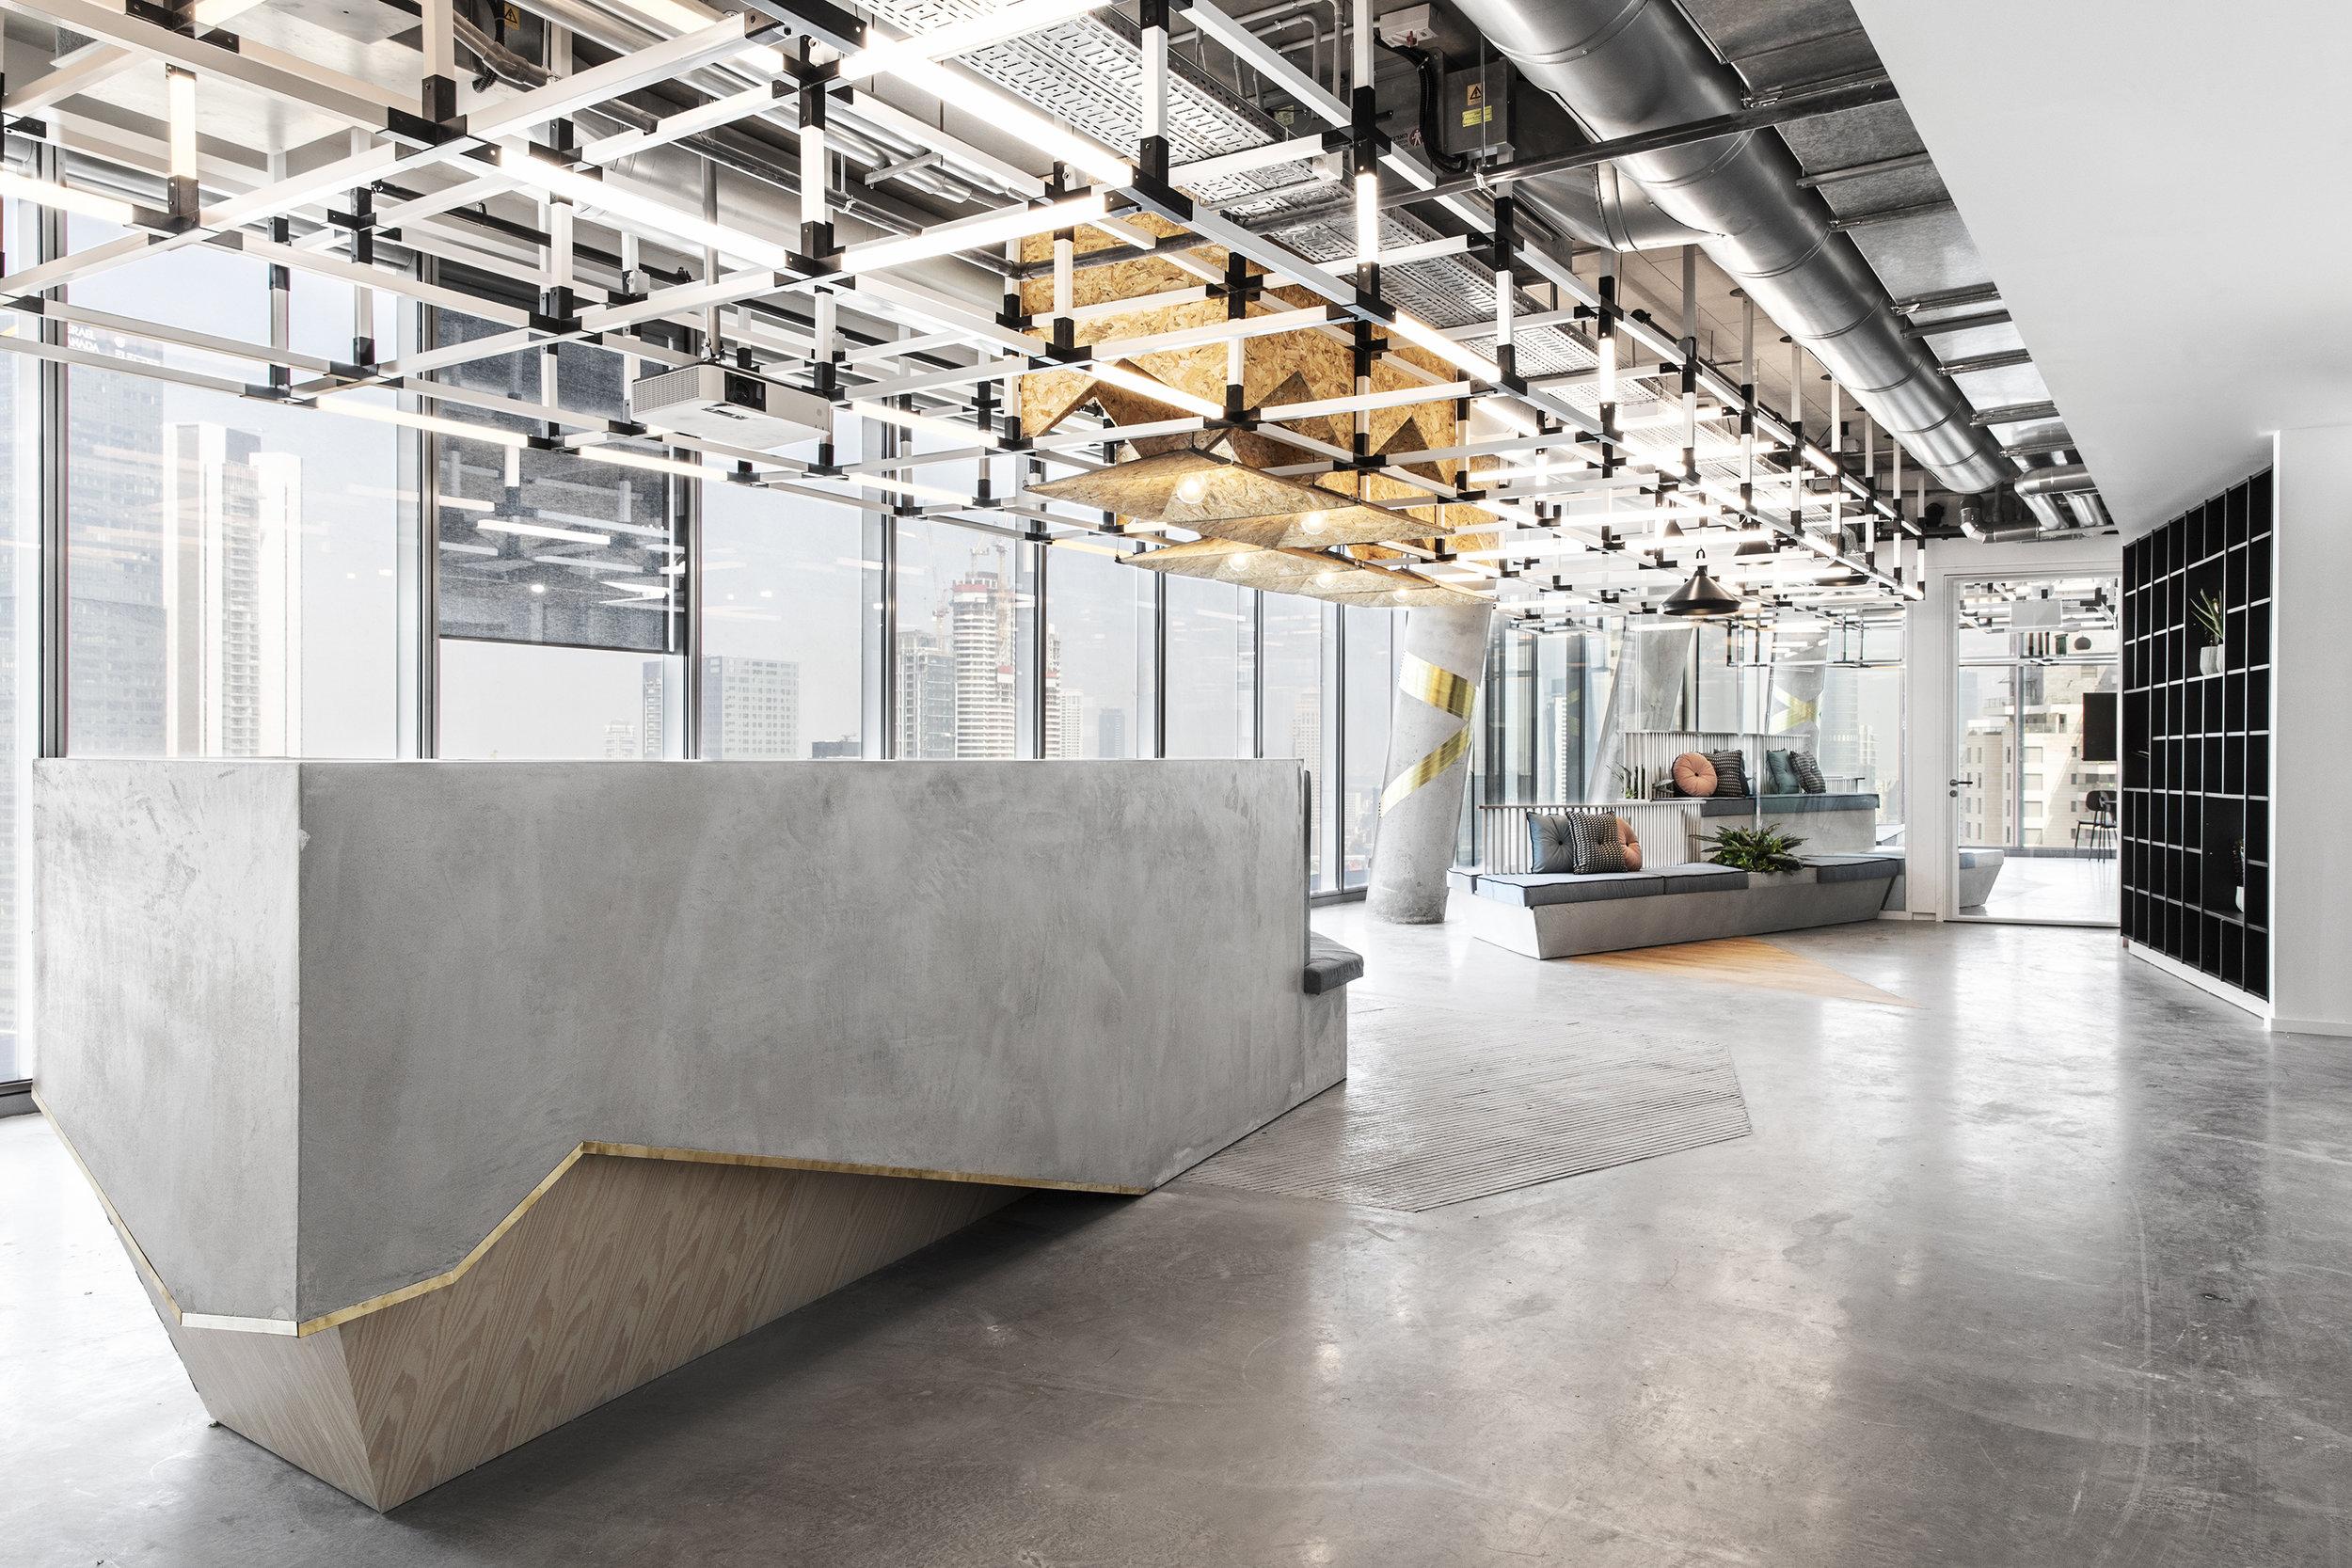 רואי דוד אדריכלות - אדריכל - נטורל אינטליג'נס - ROY DAVID - ARCHITECTURE - ARCHITECT - NI (31).jpg